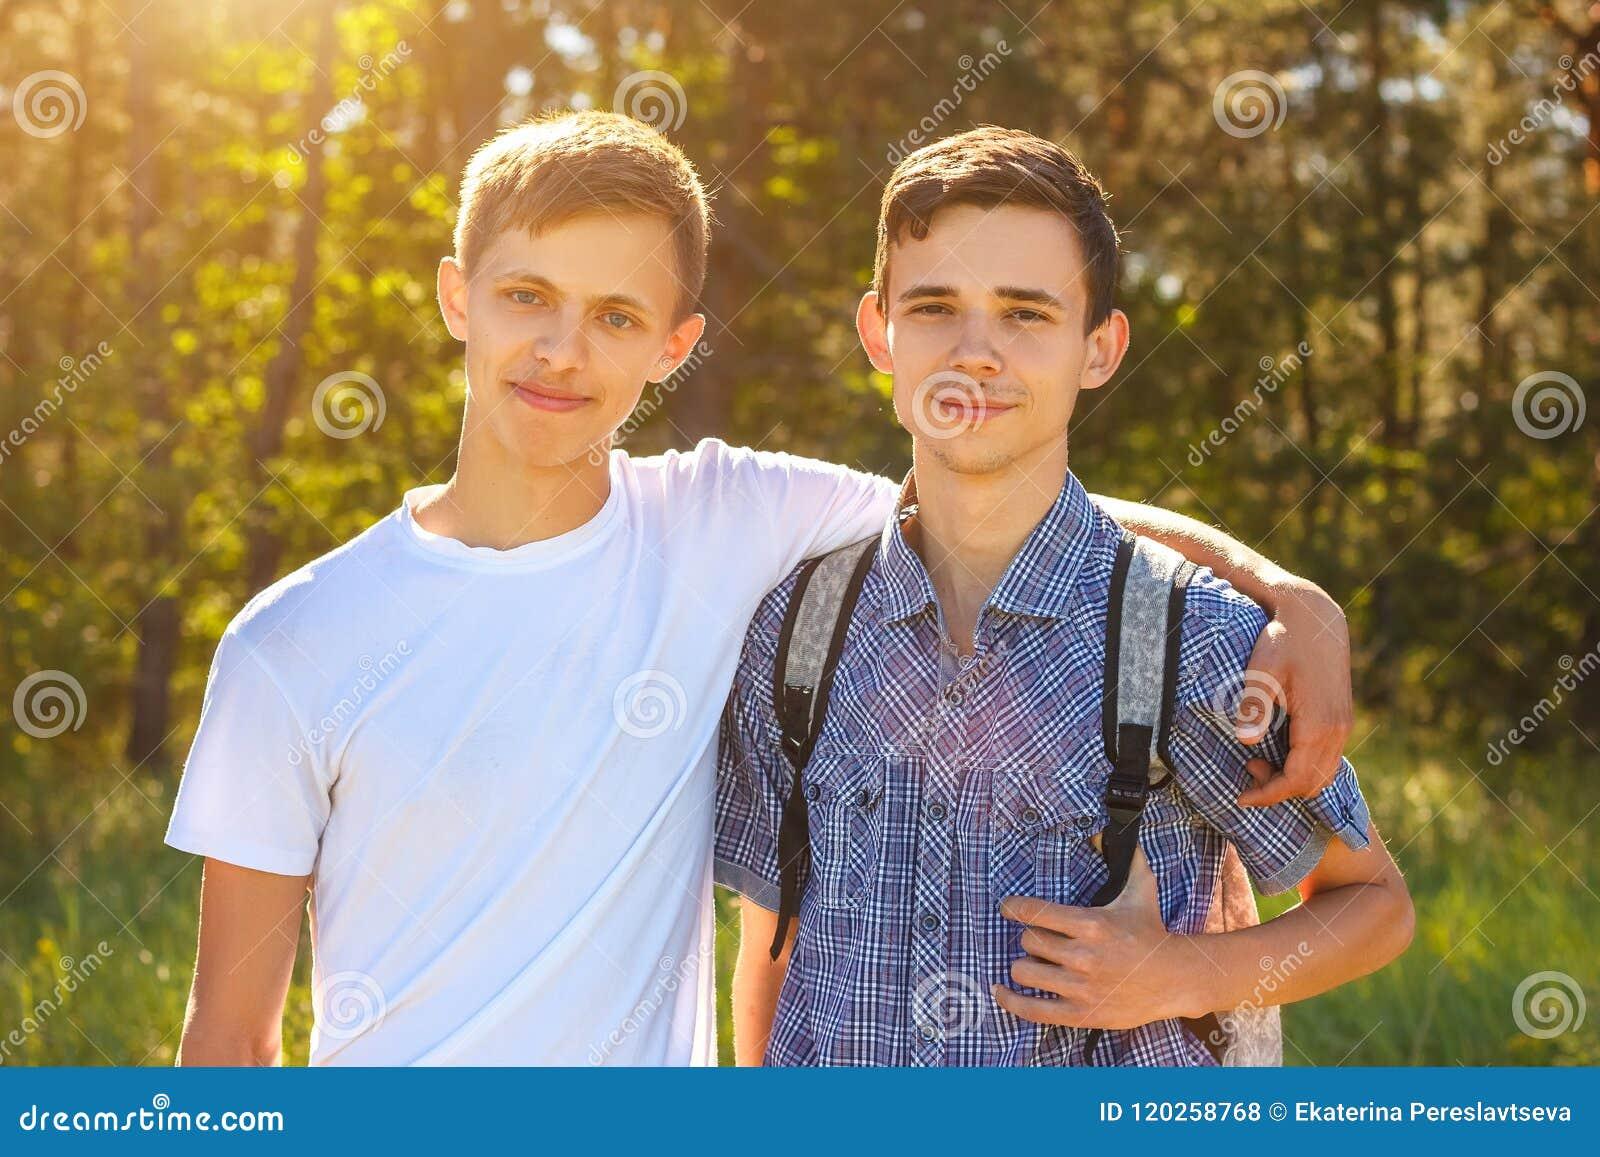 Two guys hugging